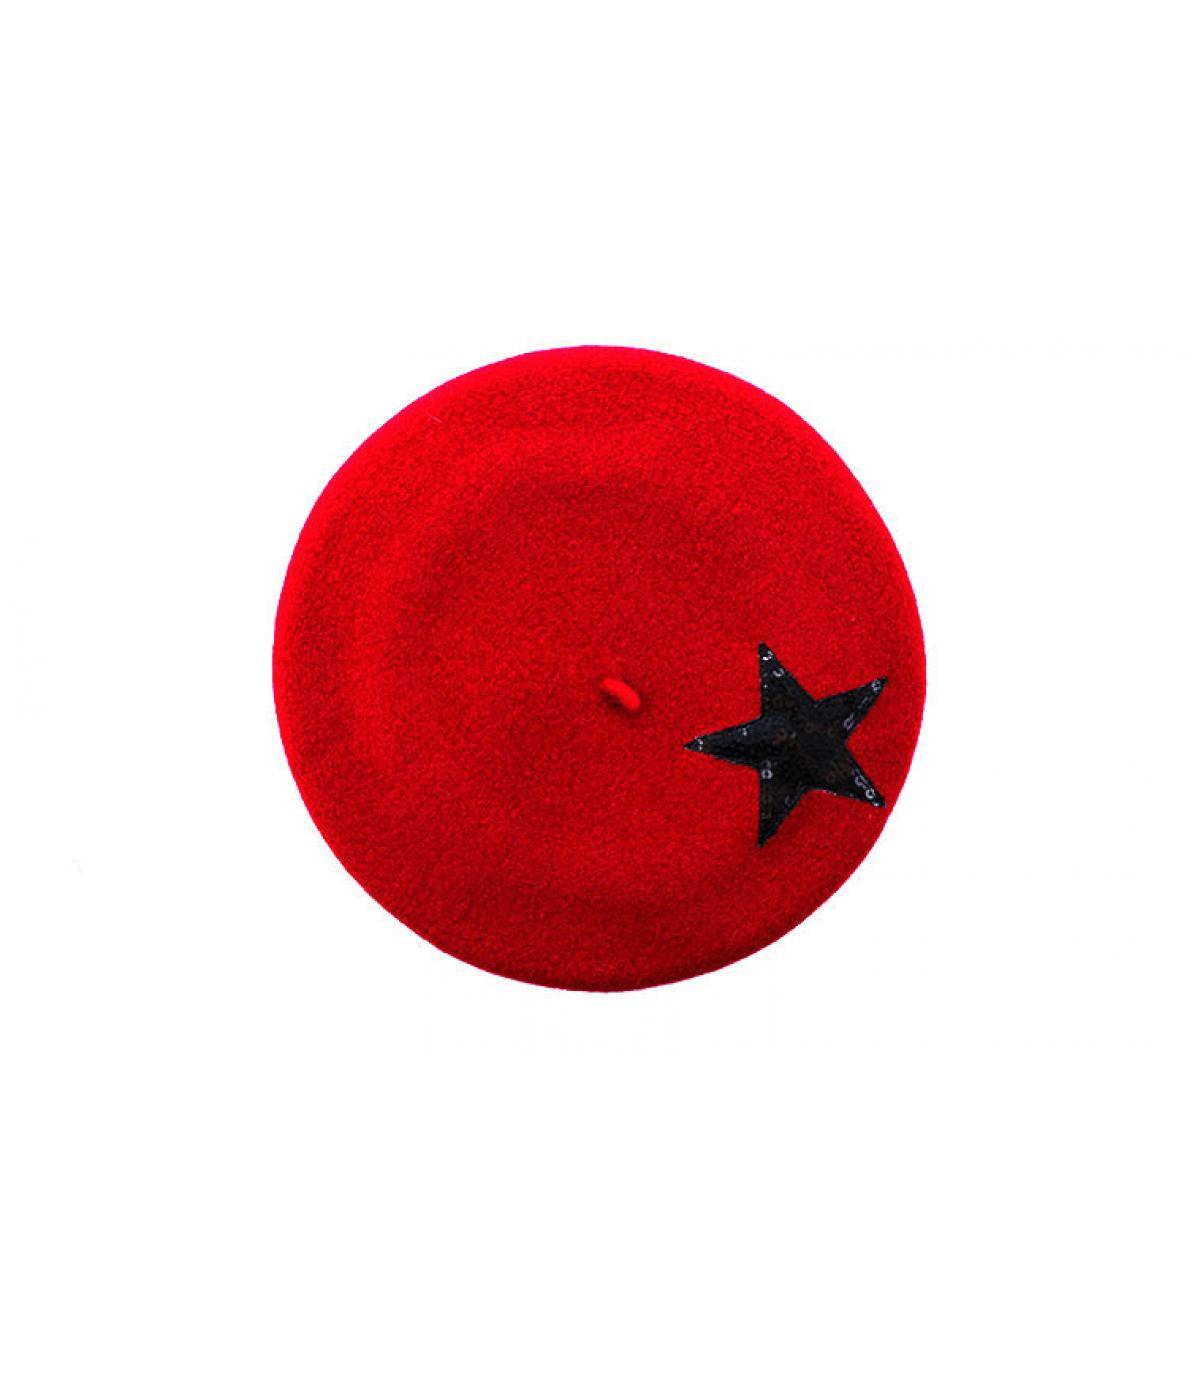 estrella de la boina roja de lentejuelas